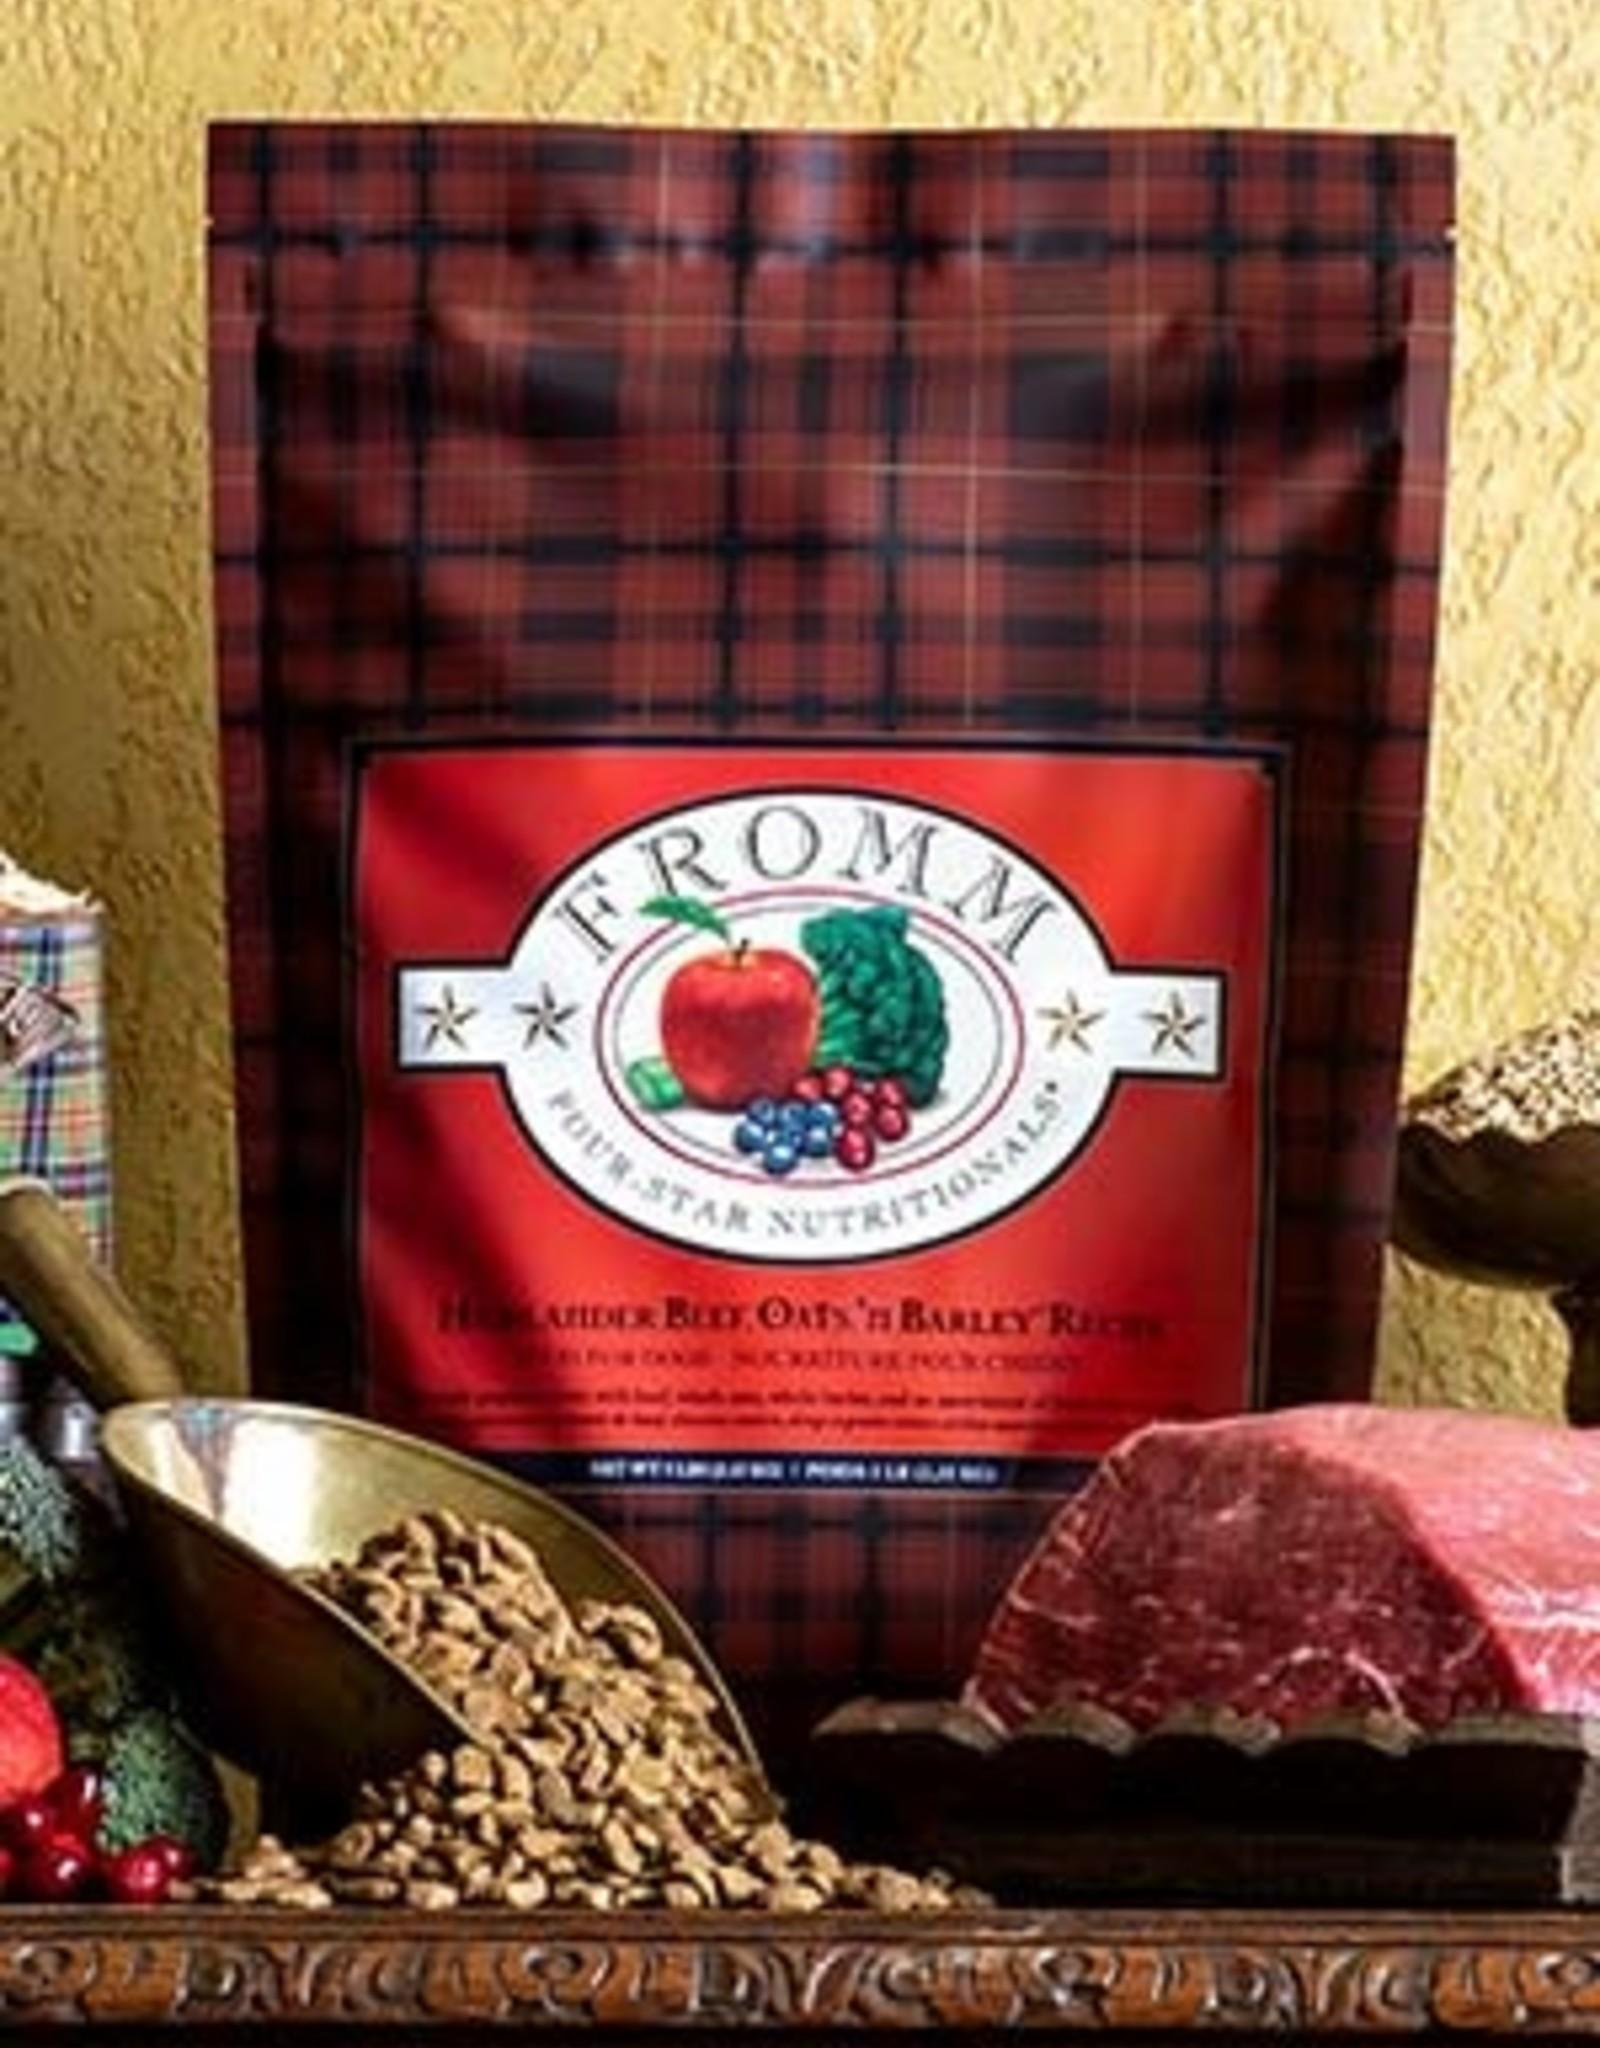 Fromm Family Pet Foods Dog Highlander Beef, Oats, 'n Barley® Recipe - Whole Grain 30lb